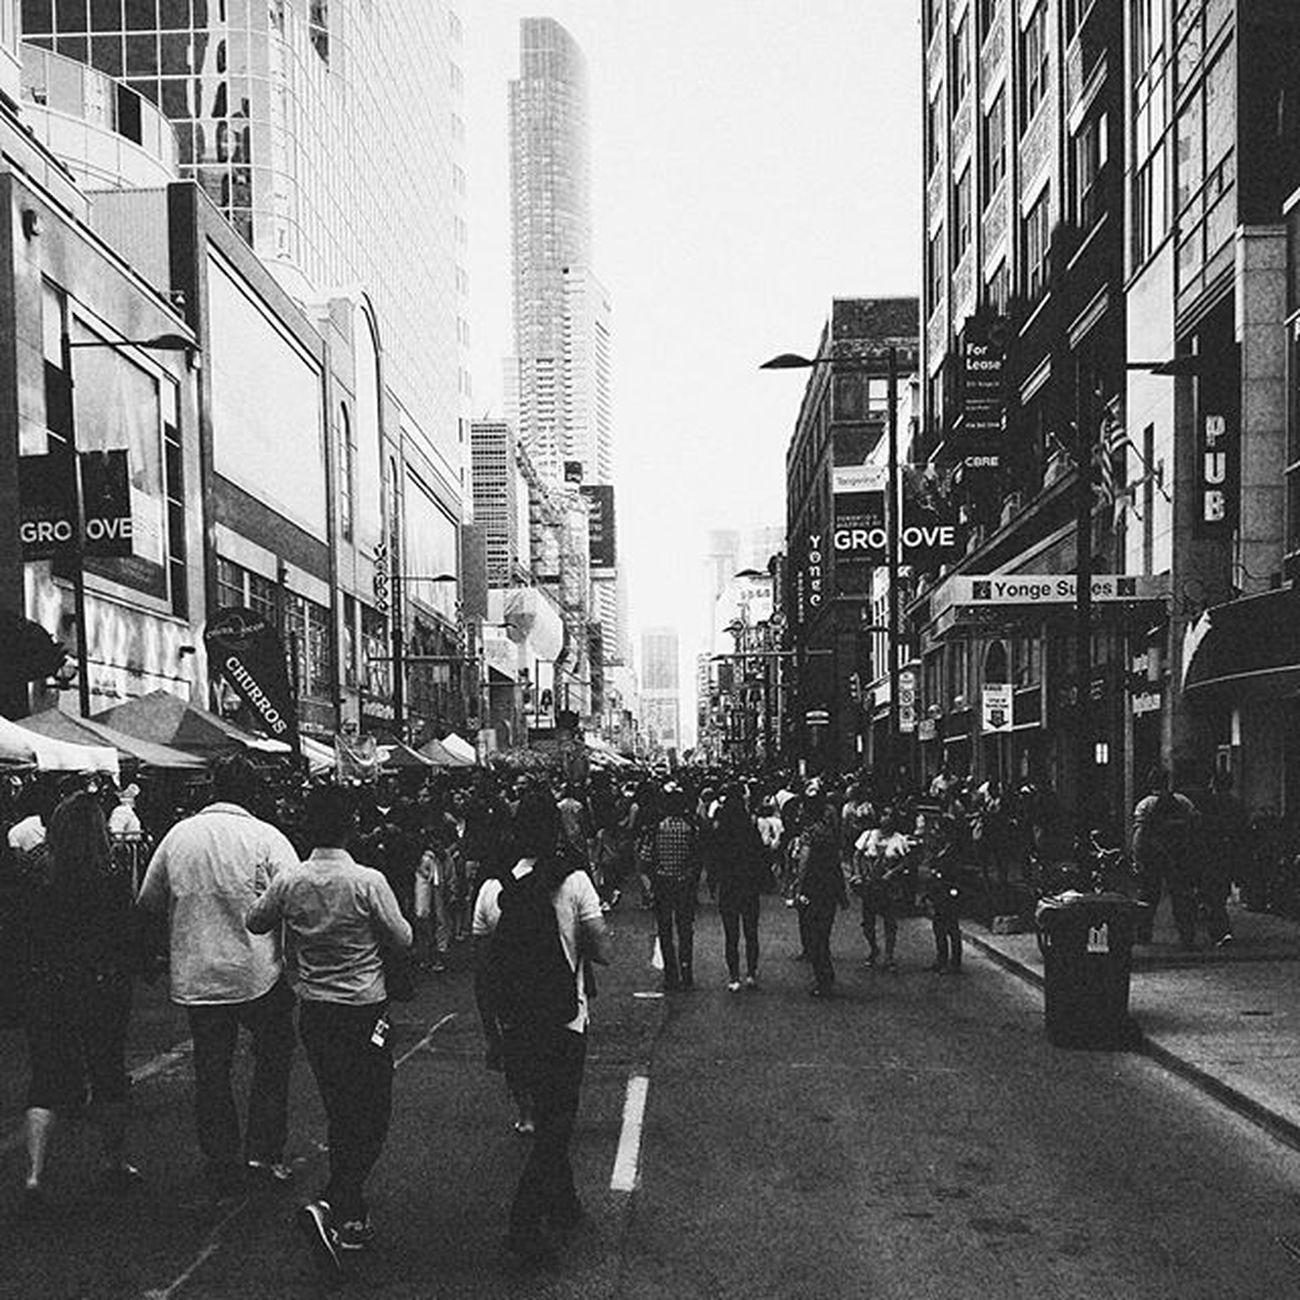 Street Street Photography Streetphoto_bw Streetphotography Toronto Torontophotographer Yonge Yongest Yongestreet